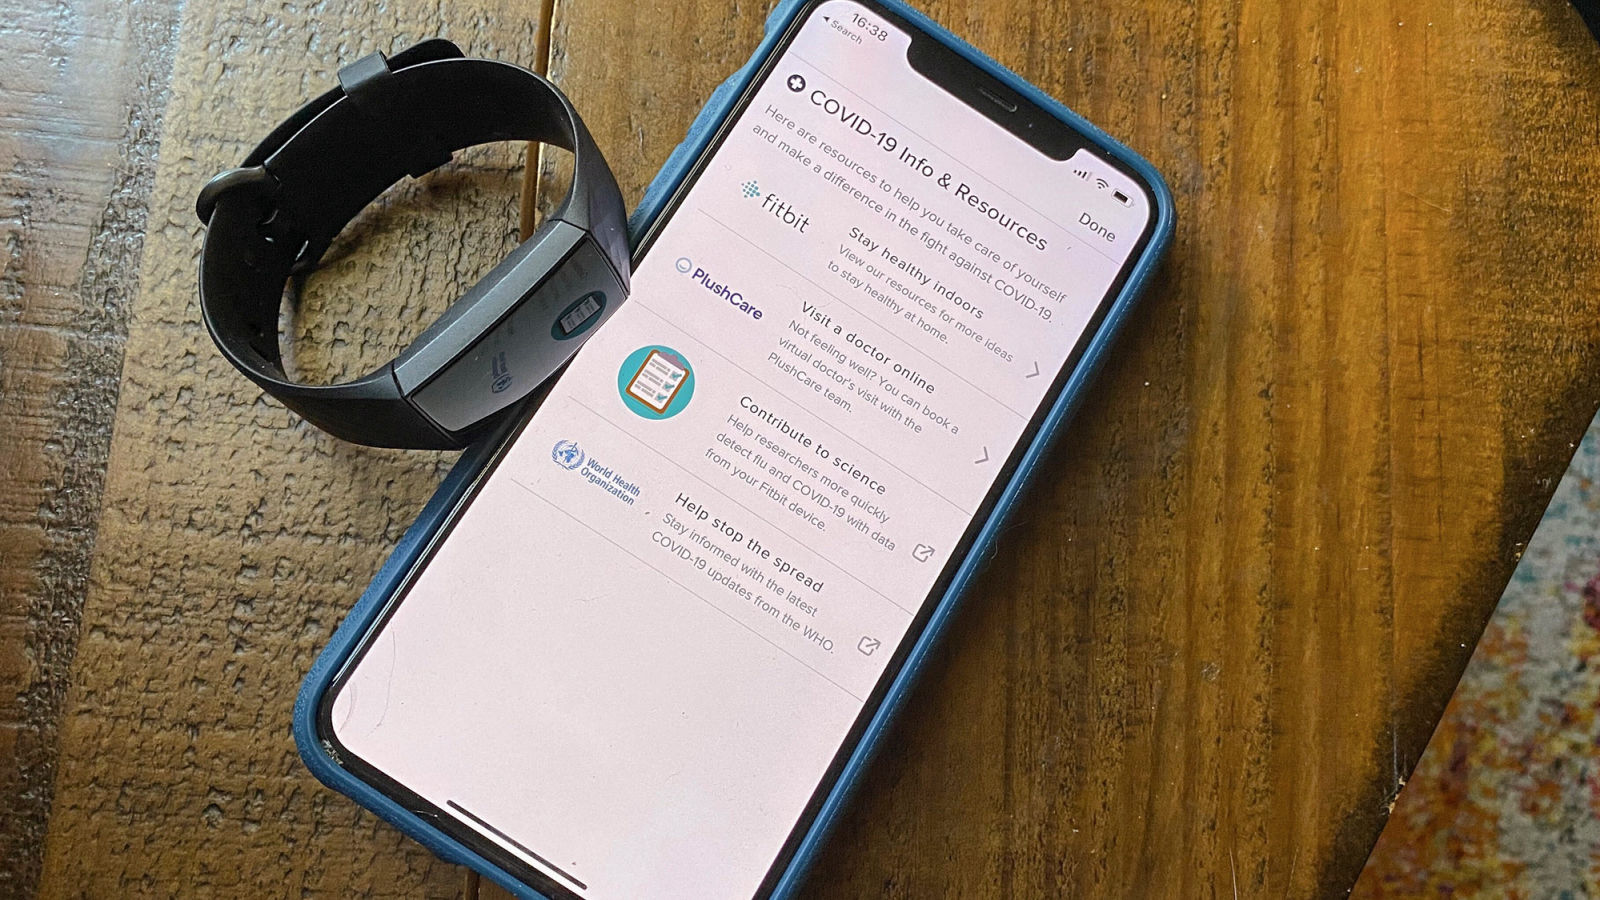 Tela do app da Fitbit com sistema para tentar detectar COVID-19. Crédito: Victoria Song/Gizmodo